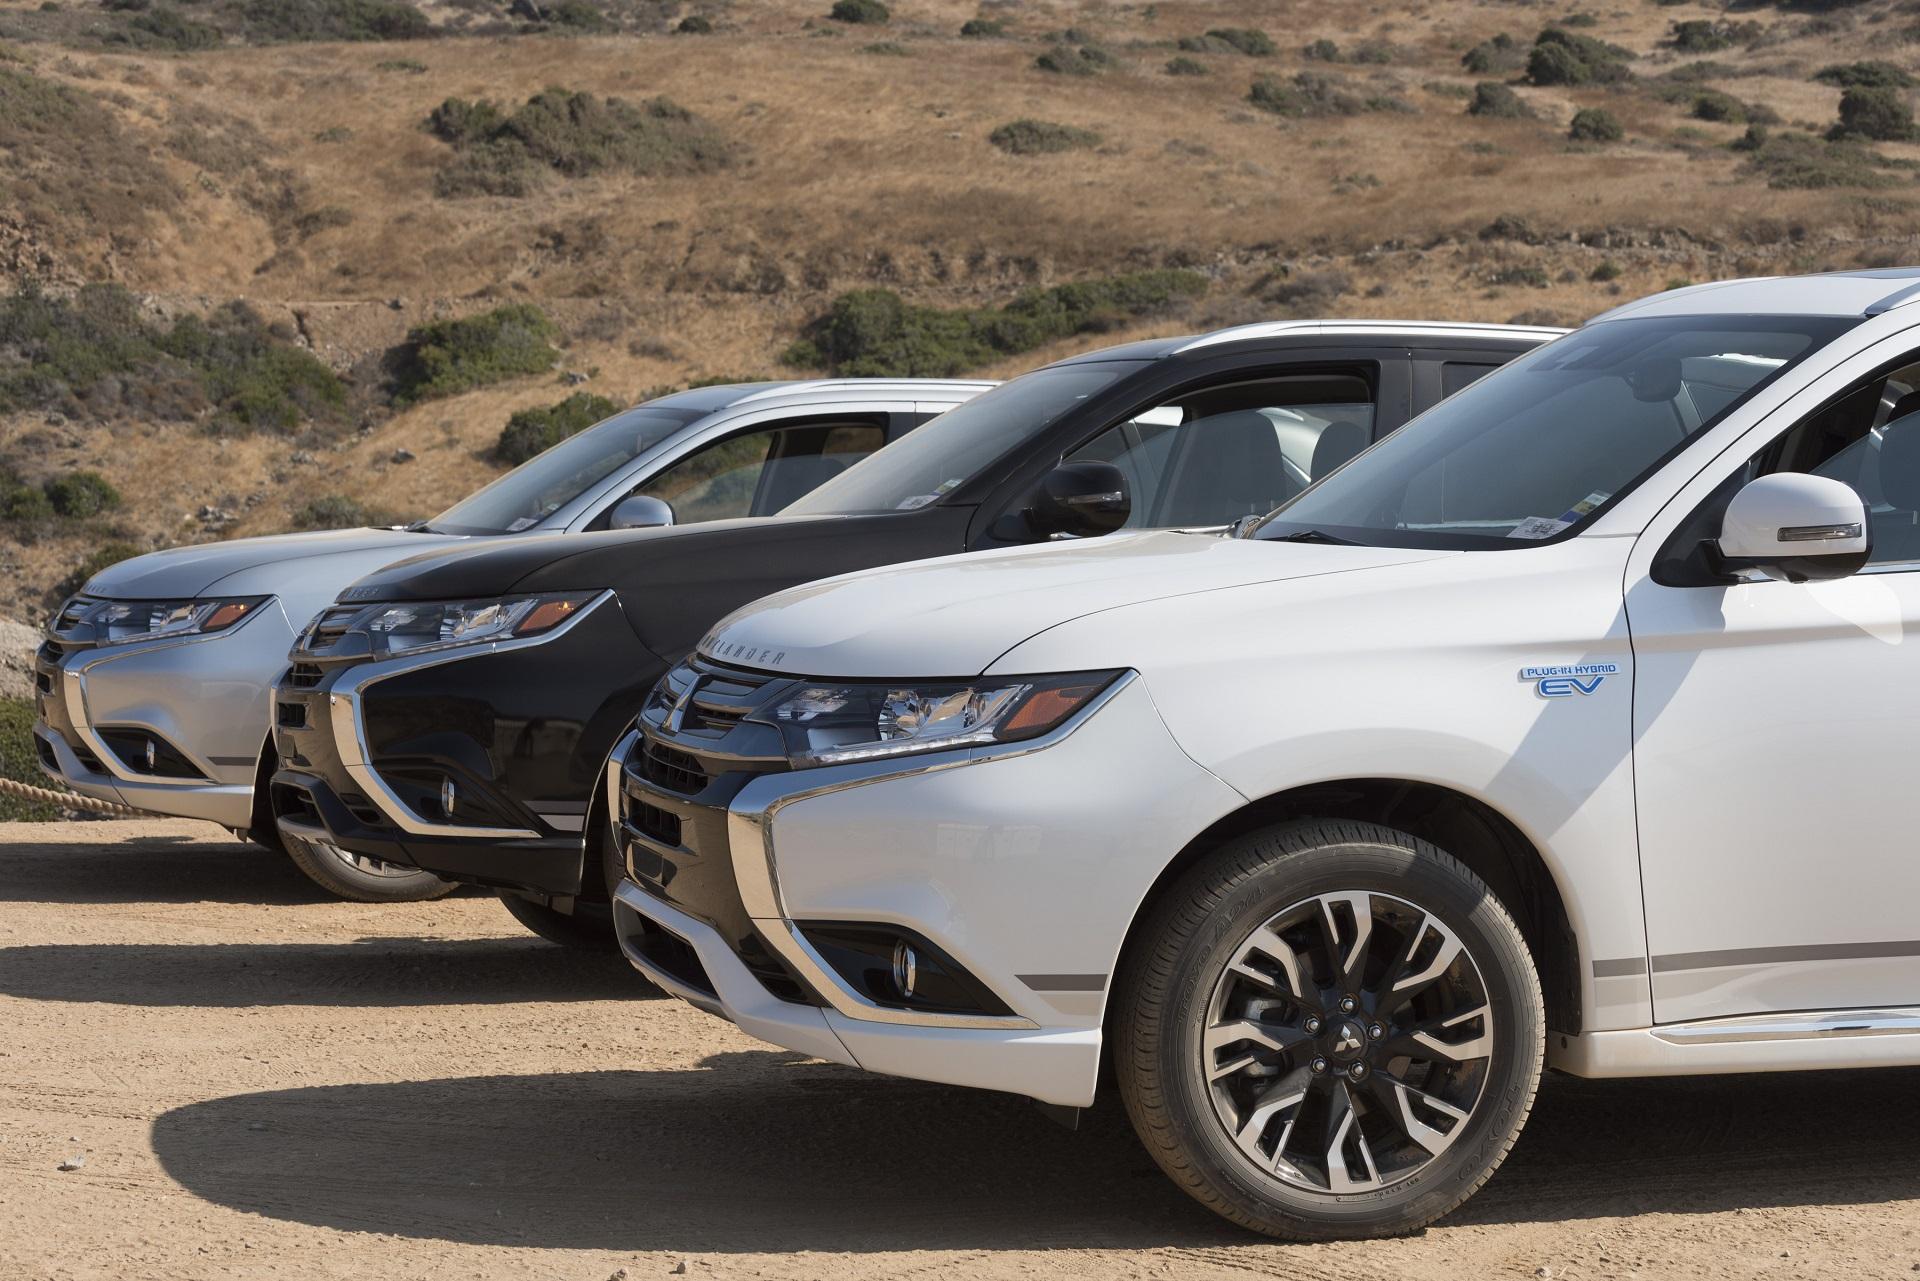 outlander phev accord hybrid  drives vw diesel cost tesla energy analysis todays car news